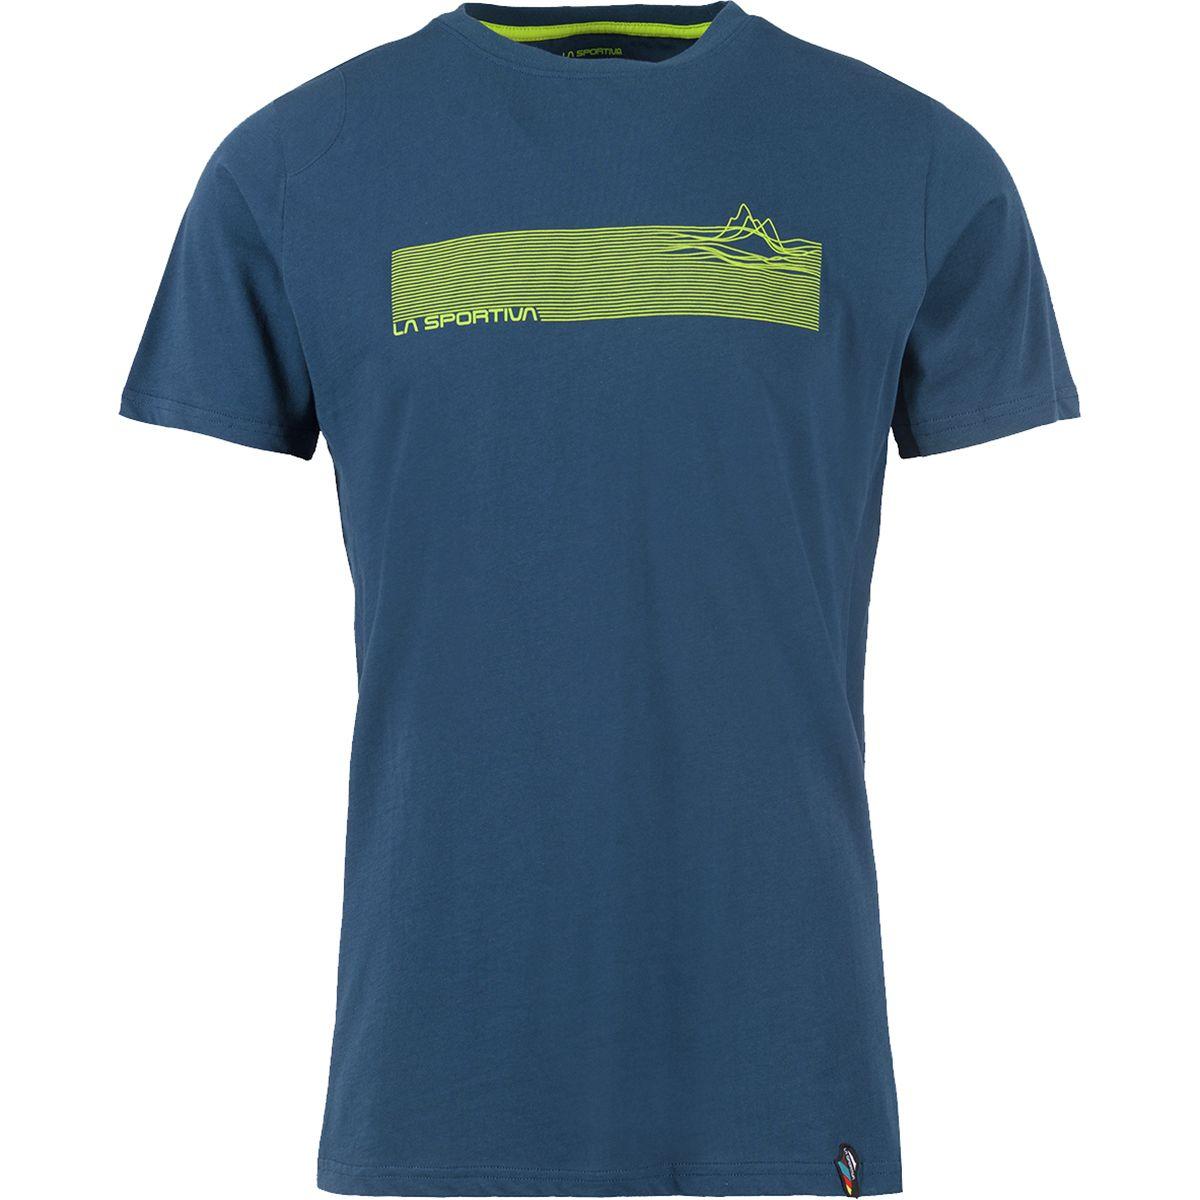 La Sportiva Pulse Man T-Shirt